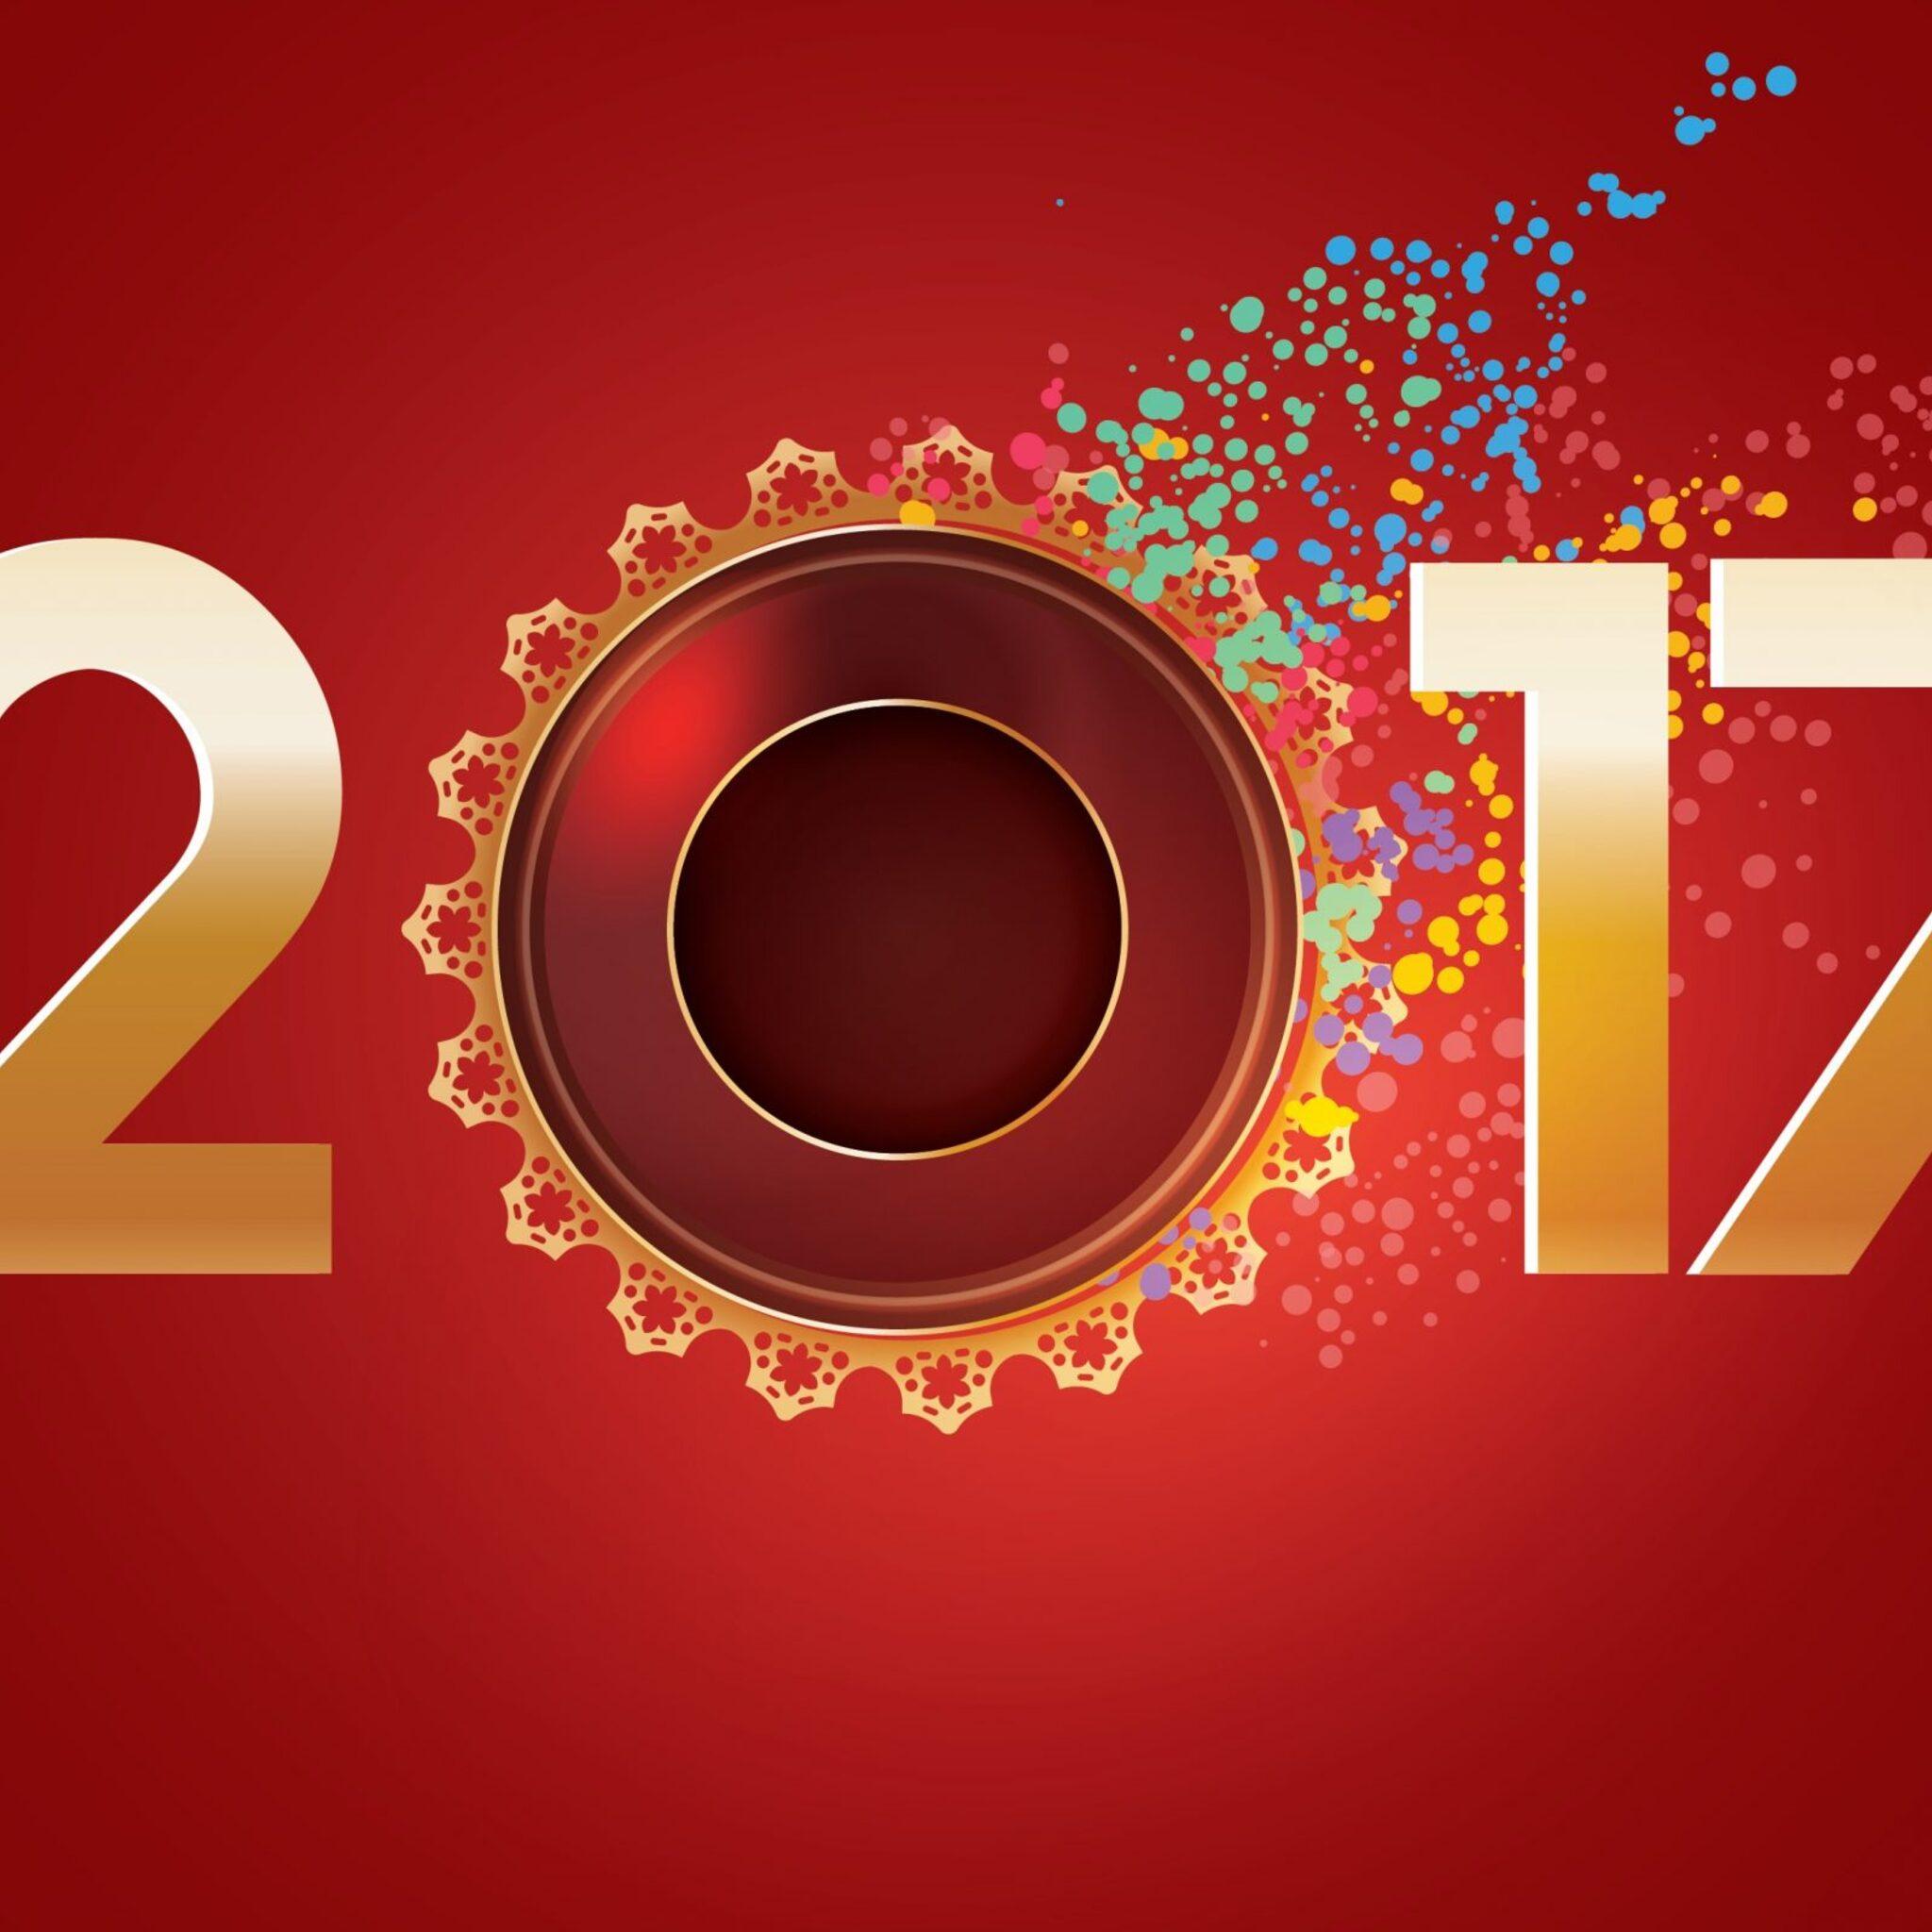 happy-new-year-greeting-ad.jpg